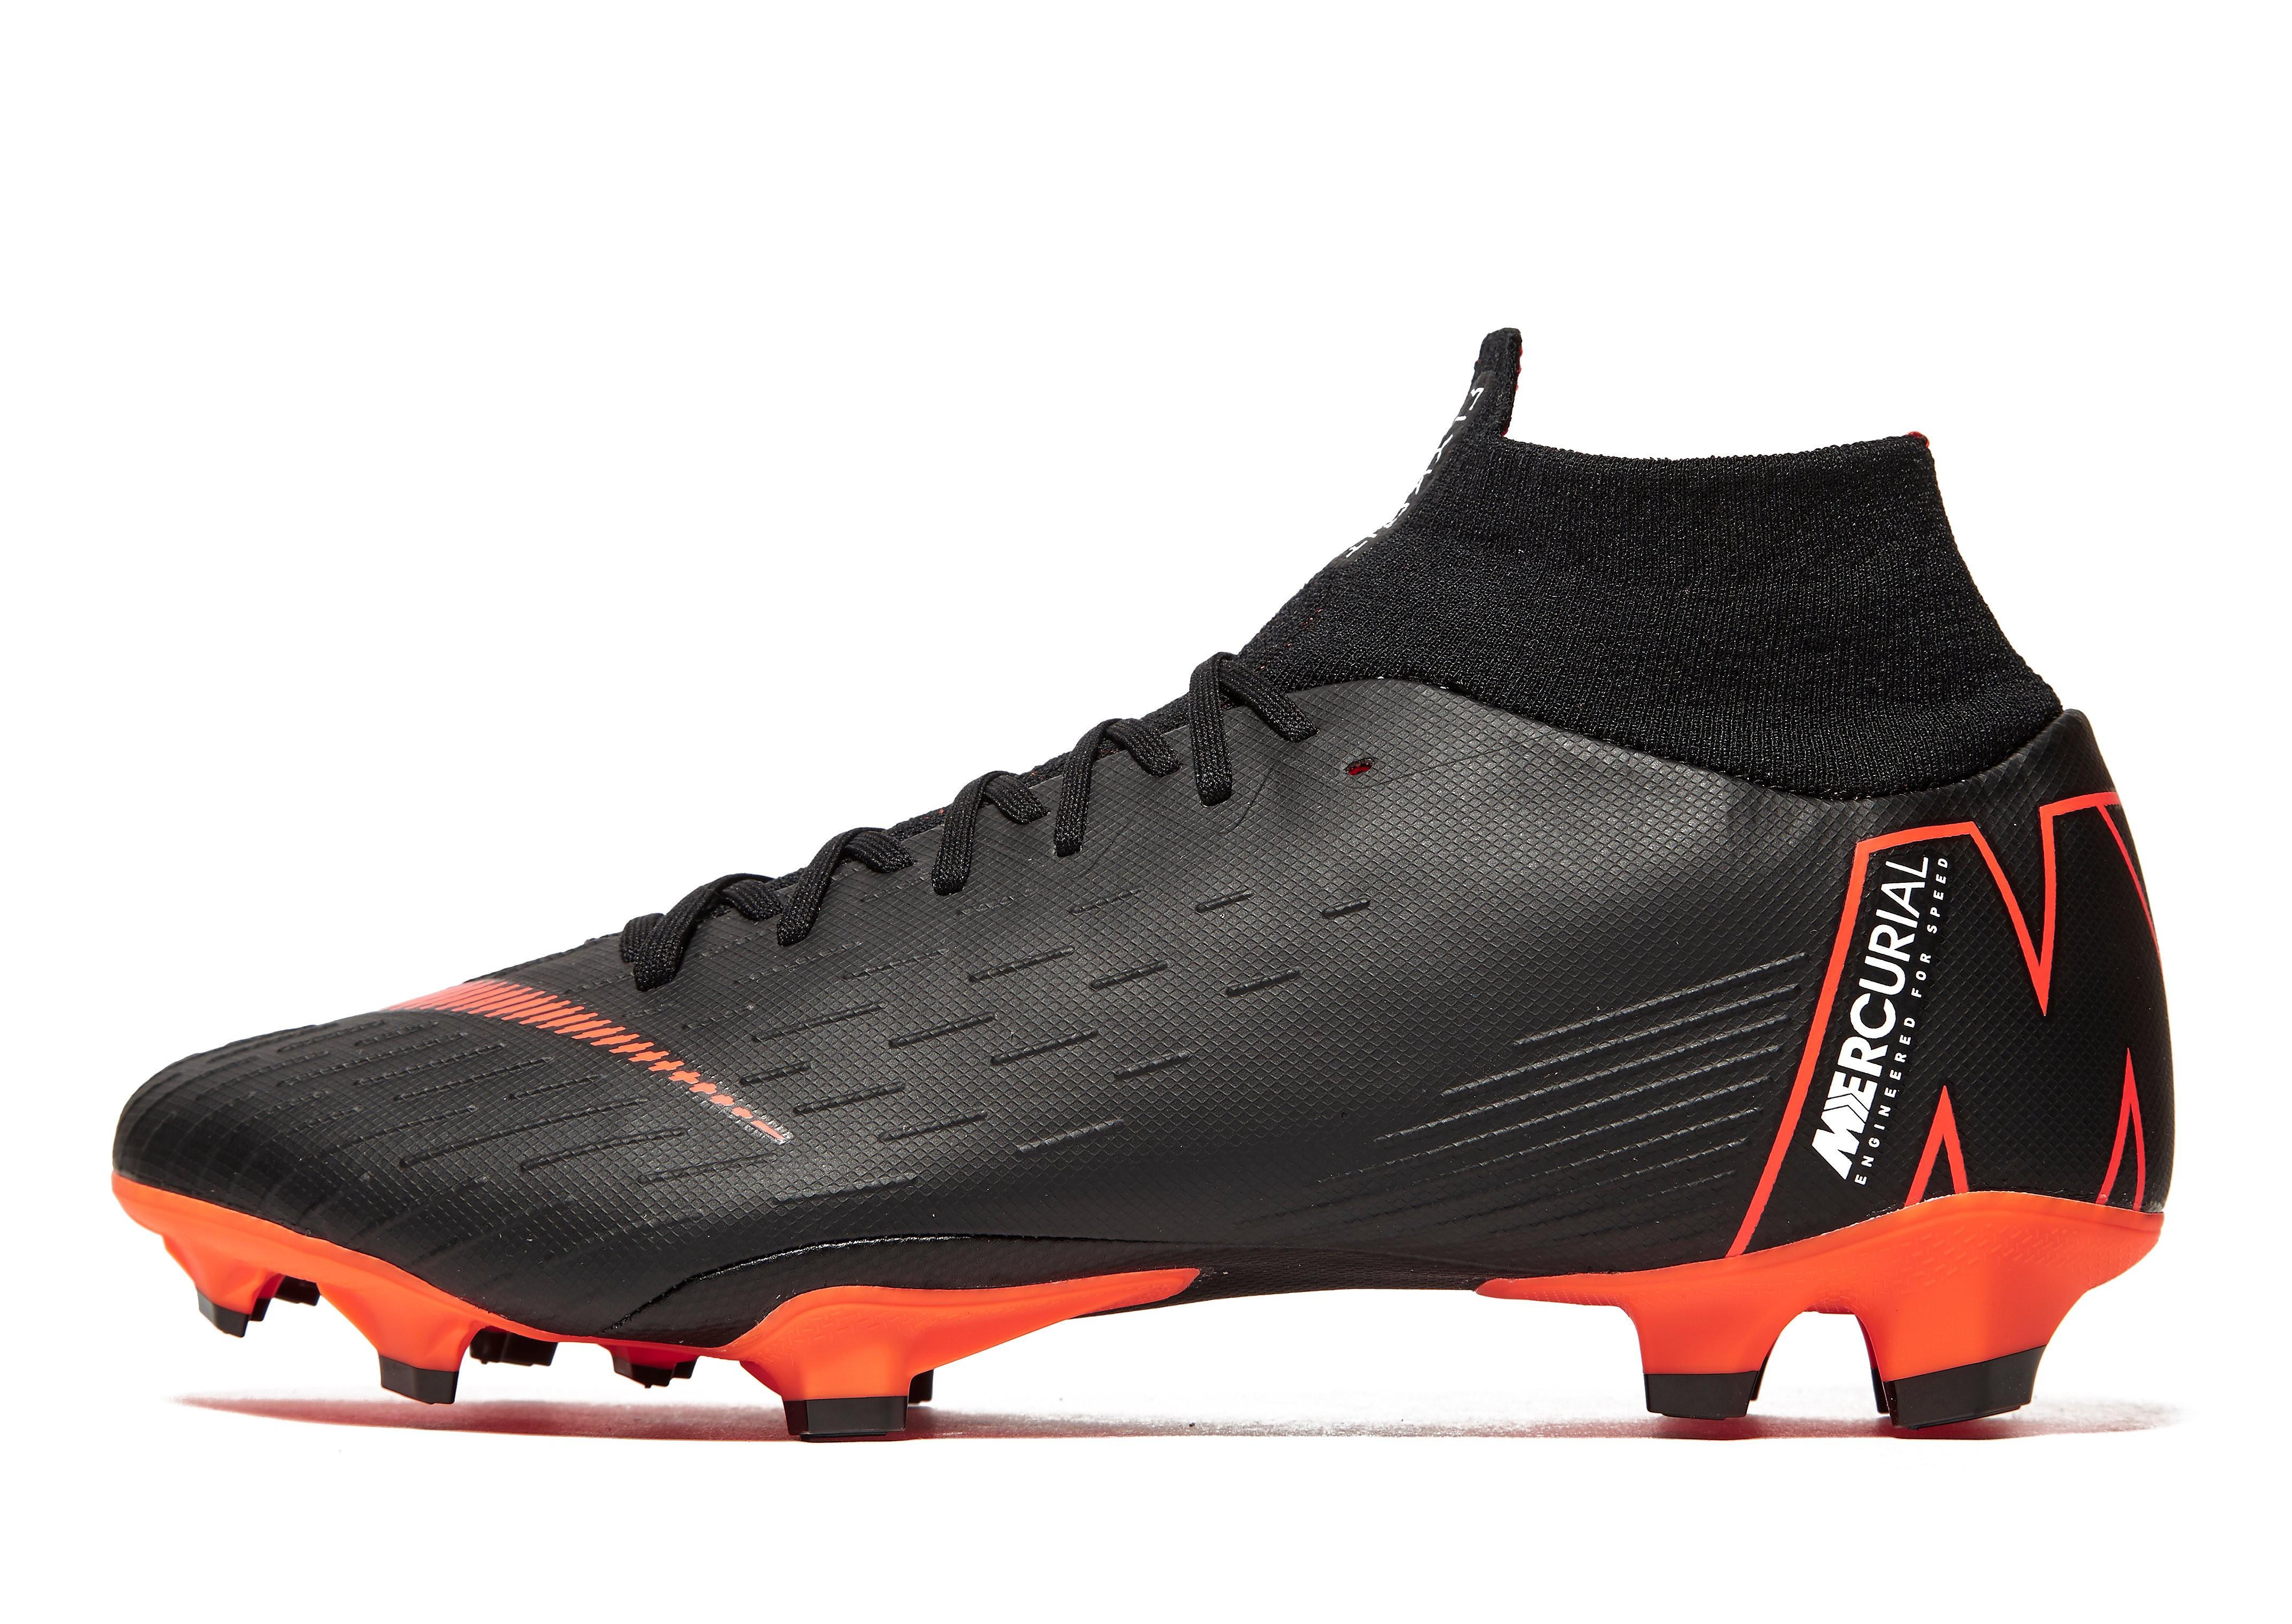 Nike Mercurial 360 Elite Dynamic Fit FG